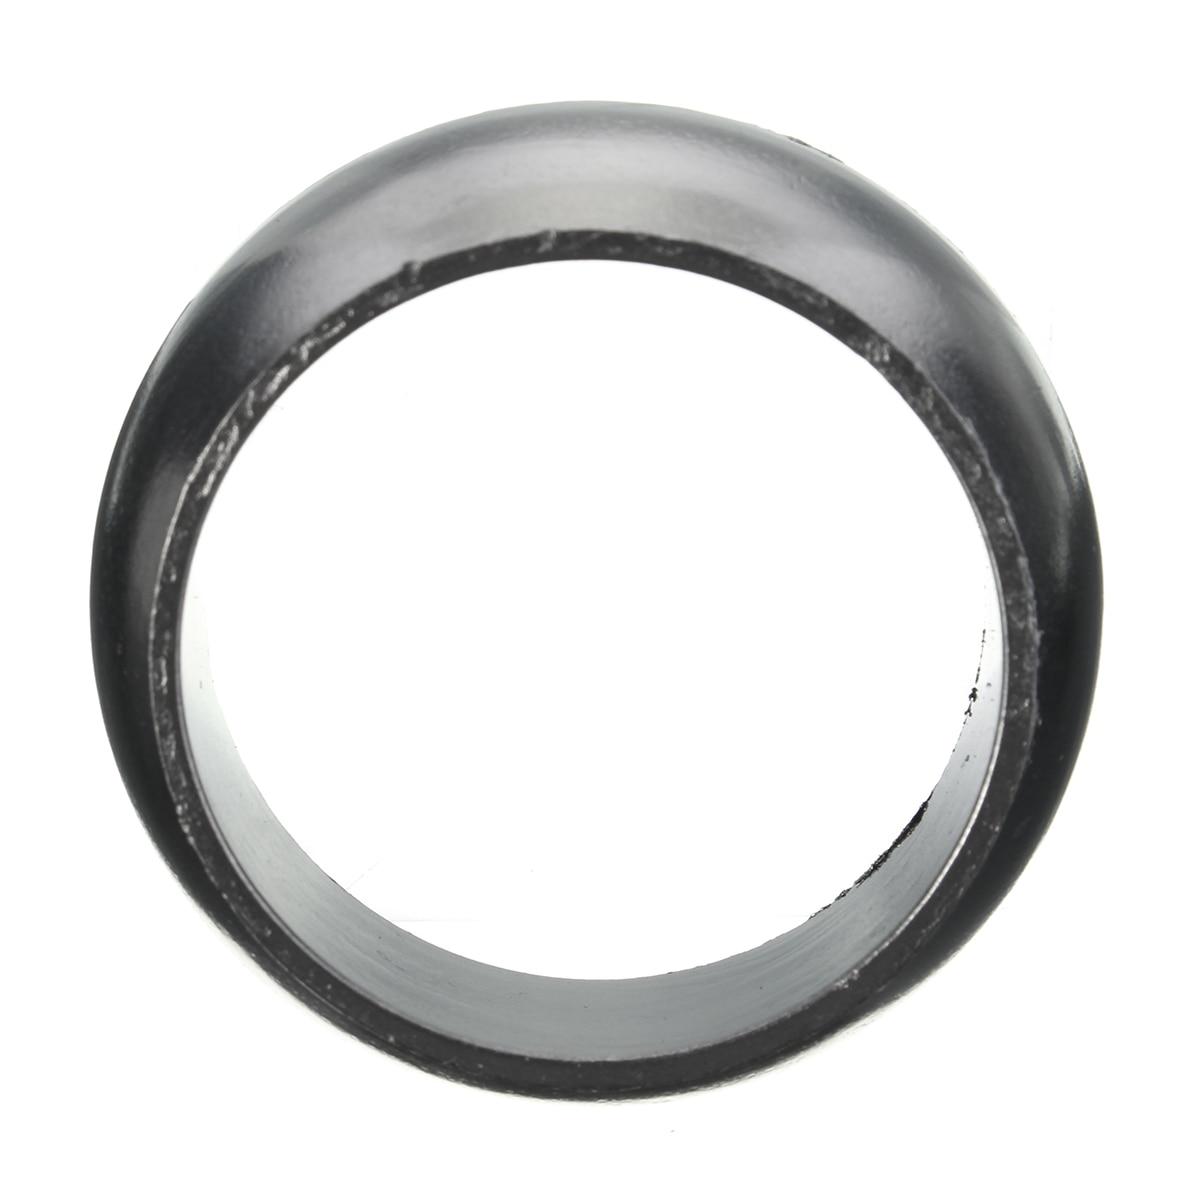 1pcs Gasket Ring For Polaris Sportman Exhaust Gasket Seal Universal For Motorcycle ATV Stainless Steel Exhaust Sealing Gaskets